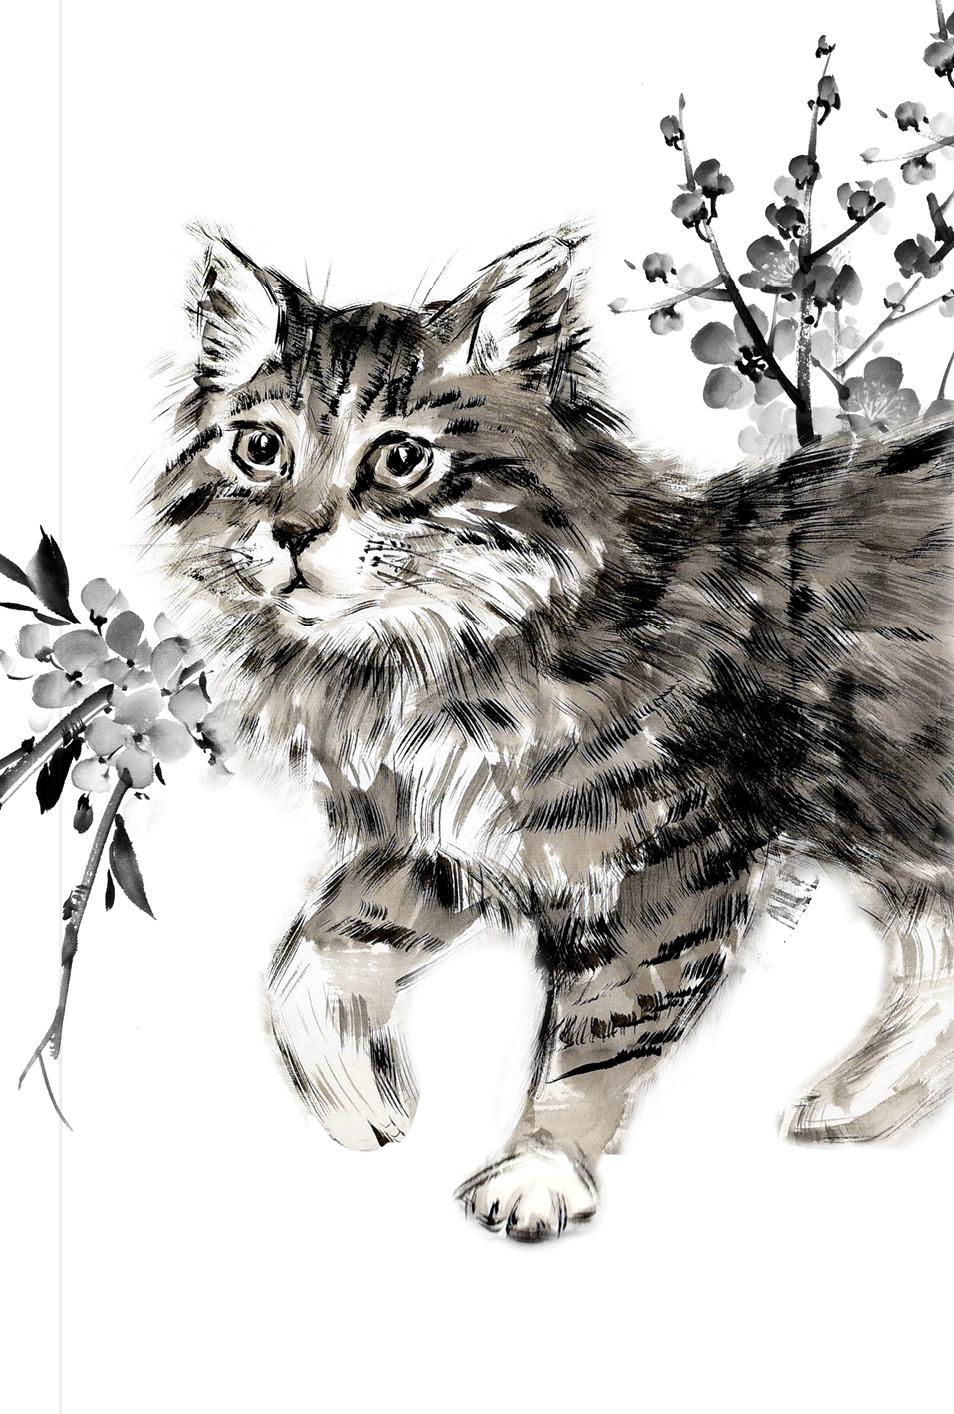 Японская живопись суми-э. Кот. Блокнот mini.